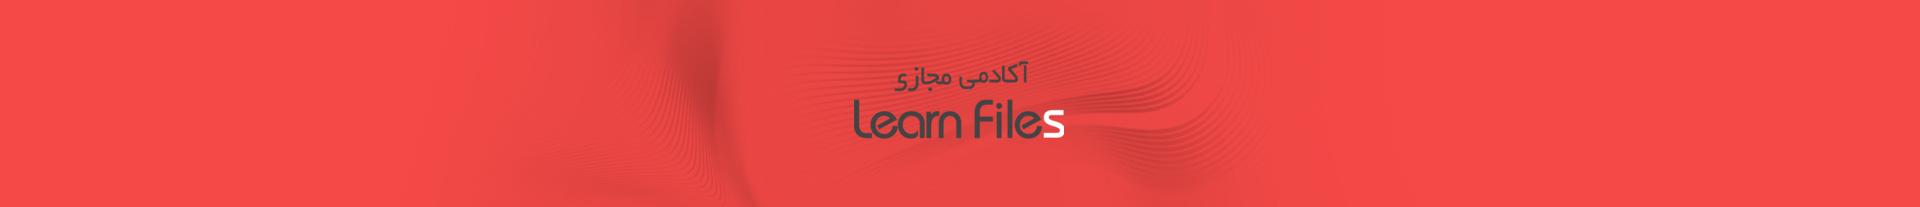 کد تخفیف لرن فایلز